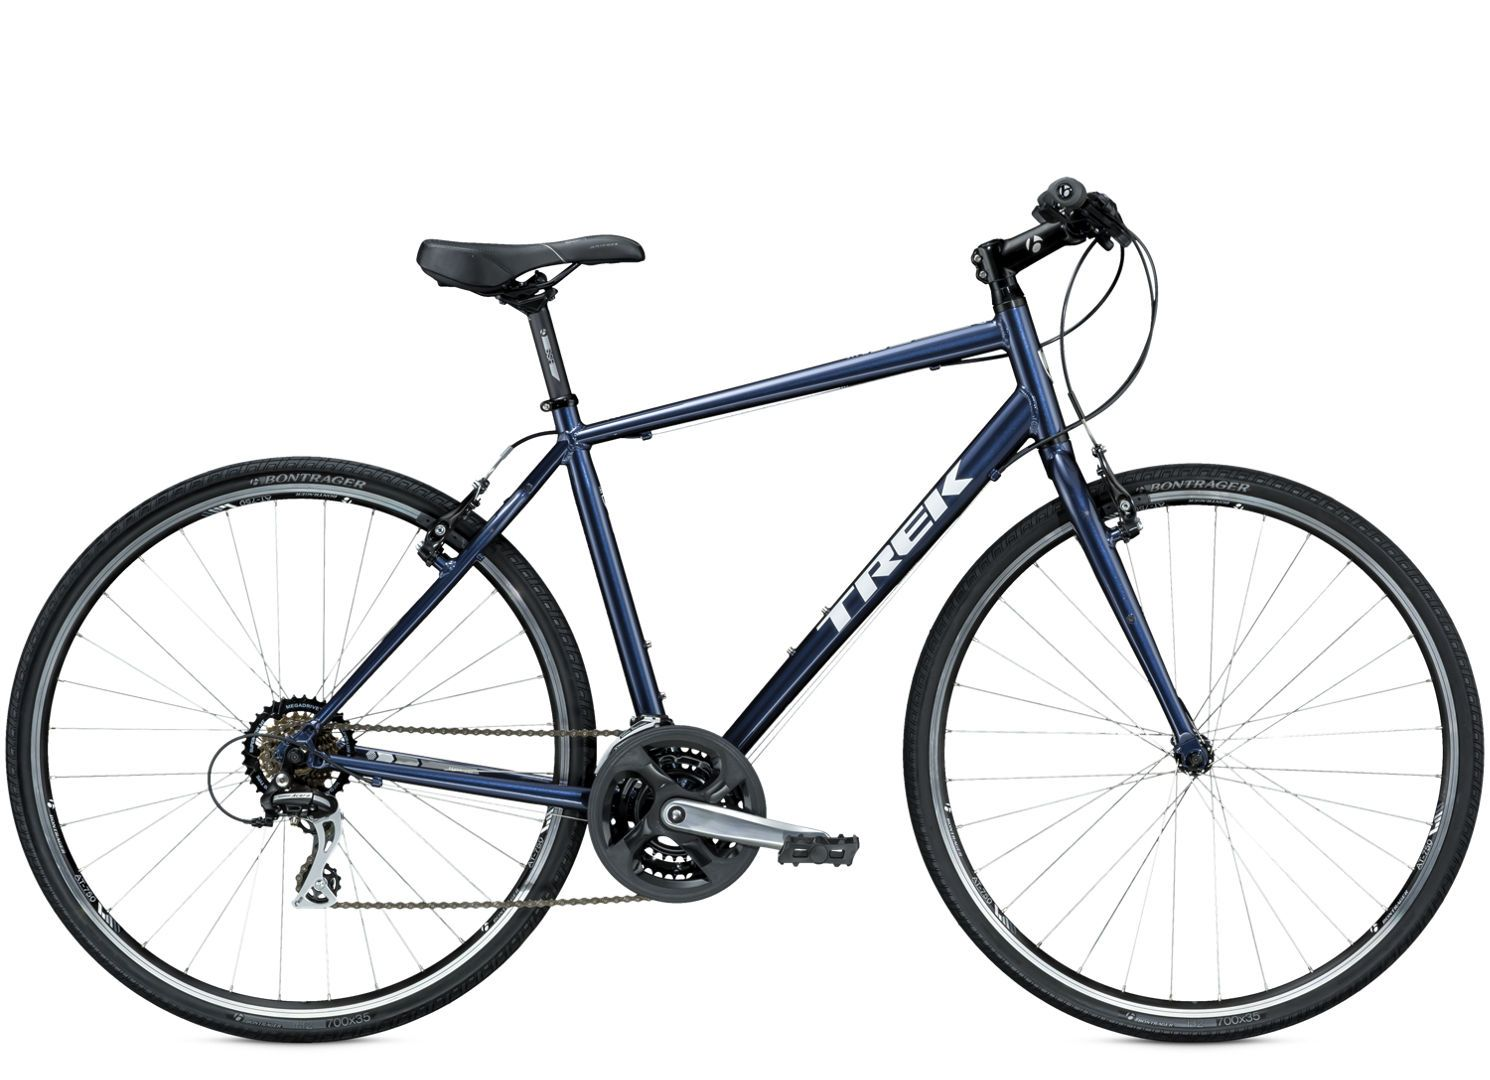 Trek 7 1 Fx 440 I Like This A Lot Too Trek Bicycle Biking Workout Trek Bikes